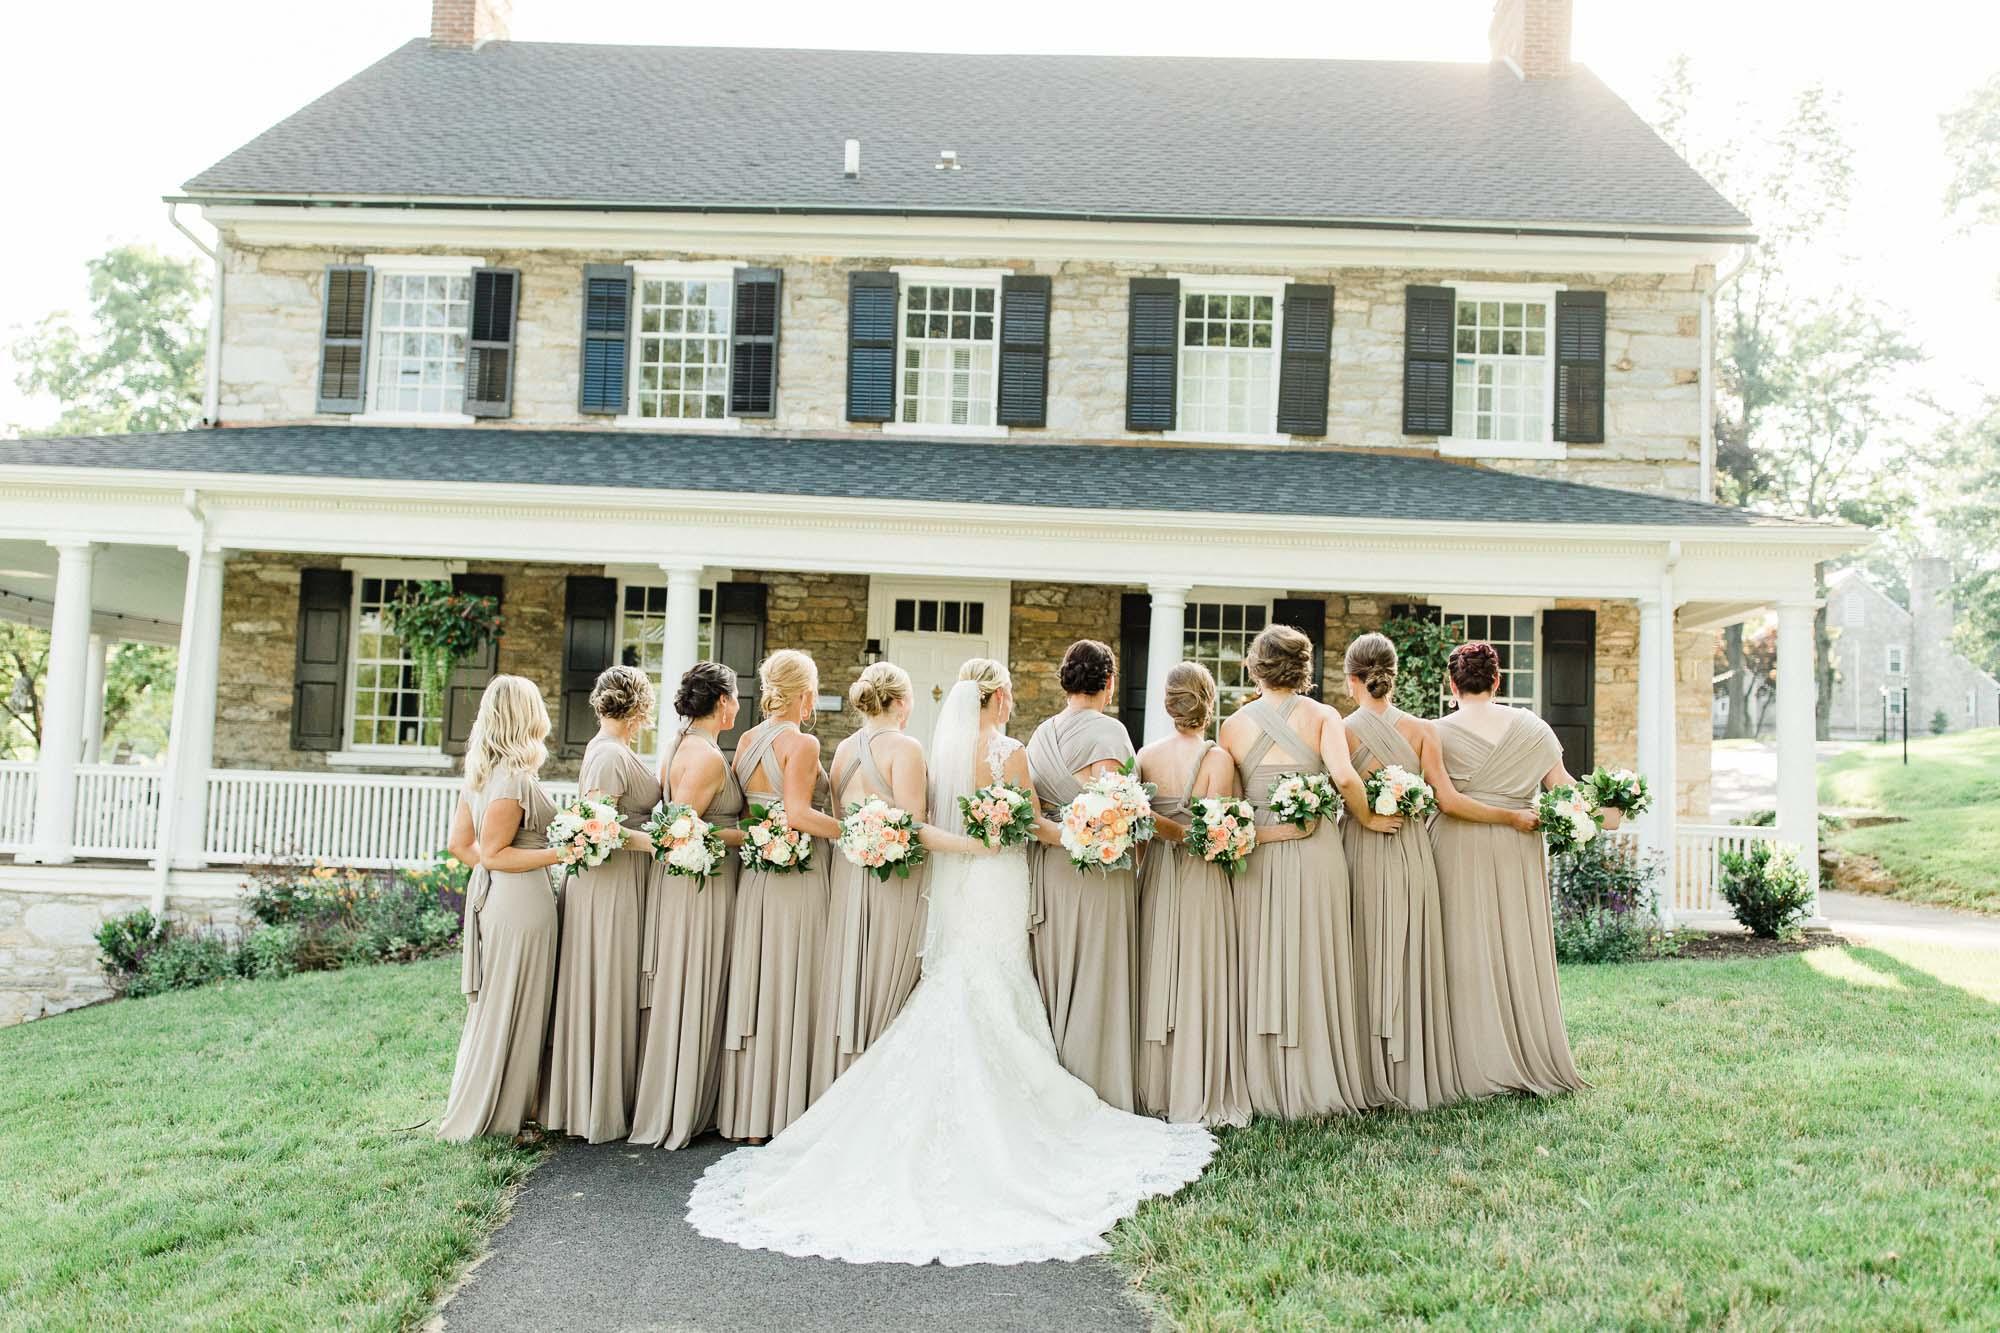 Allenberry-resort-historic-pennsylvania-wedding-10181.jpg